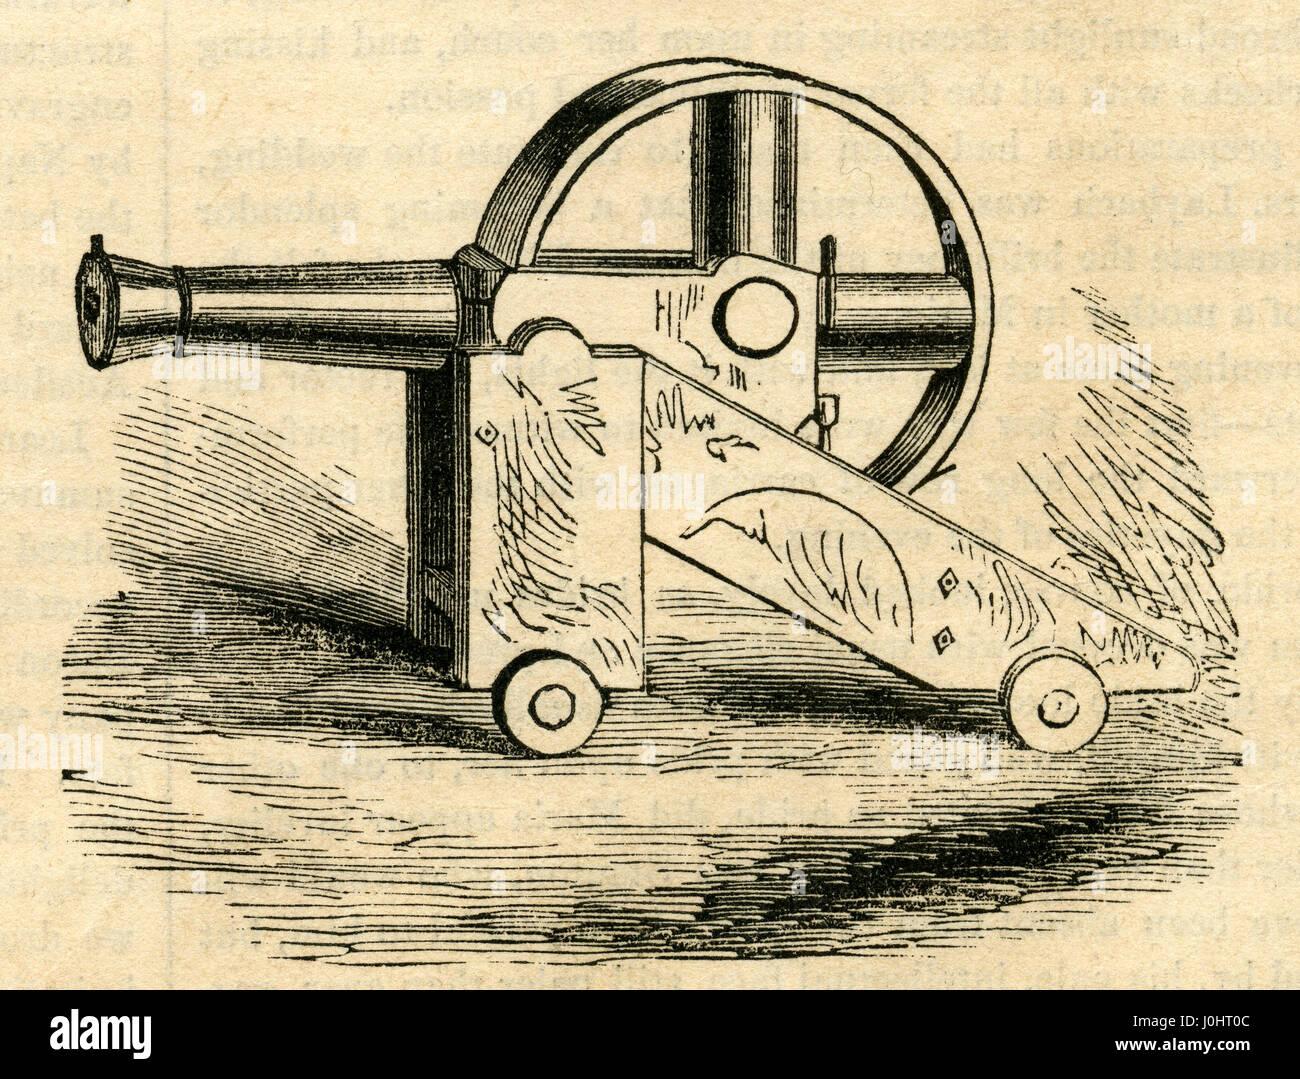 Antique 1854 engraving, 'Cochran's Revolving Cannon.' Cochran's revolving cannon was to have made - Stock Image